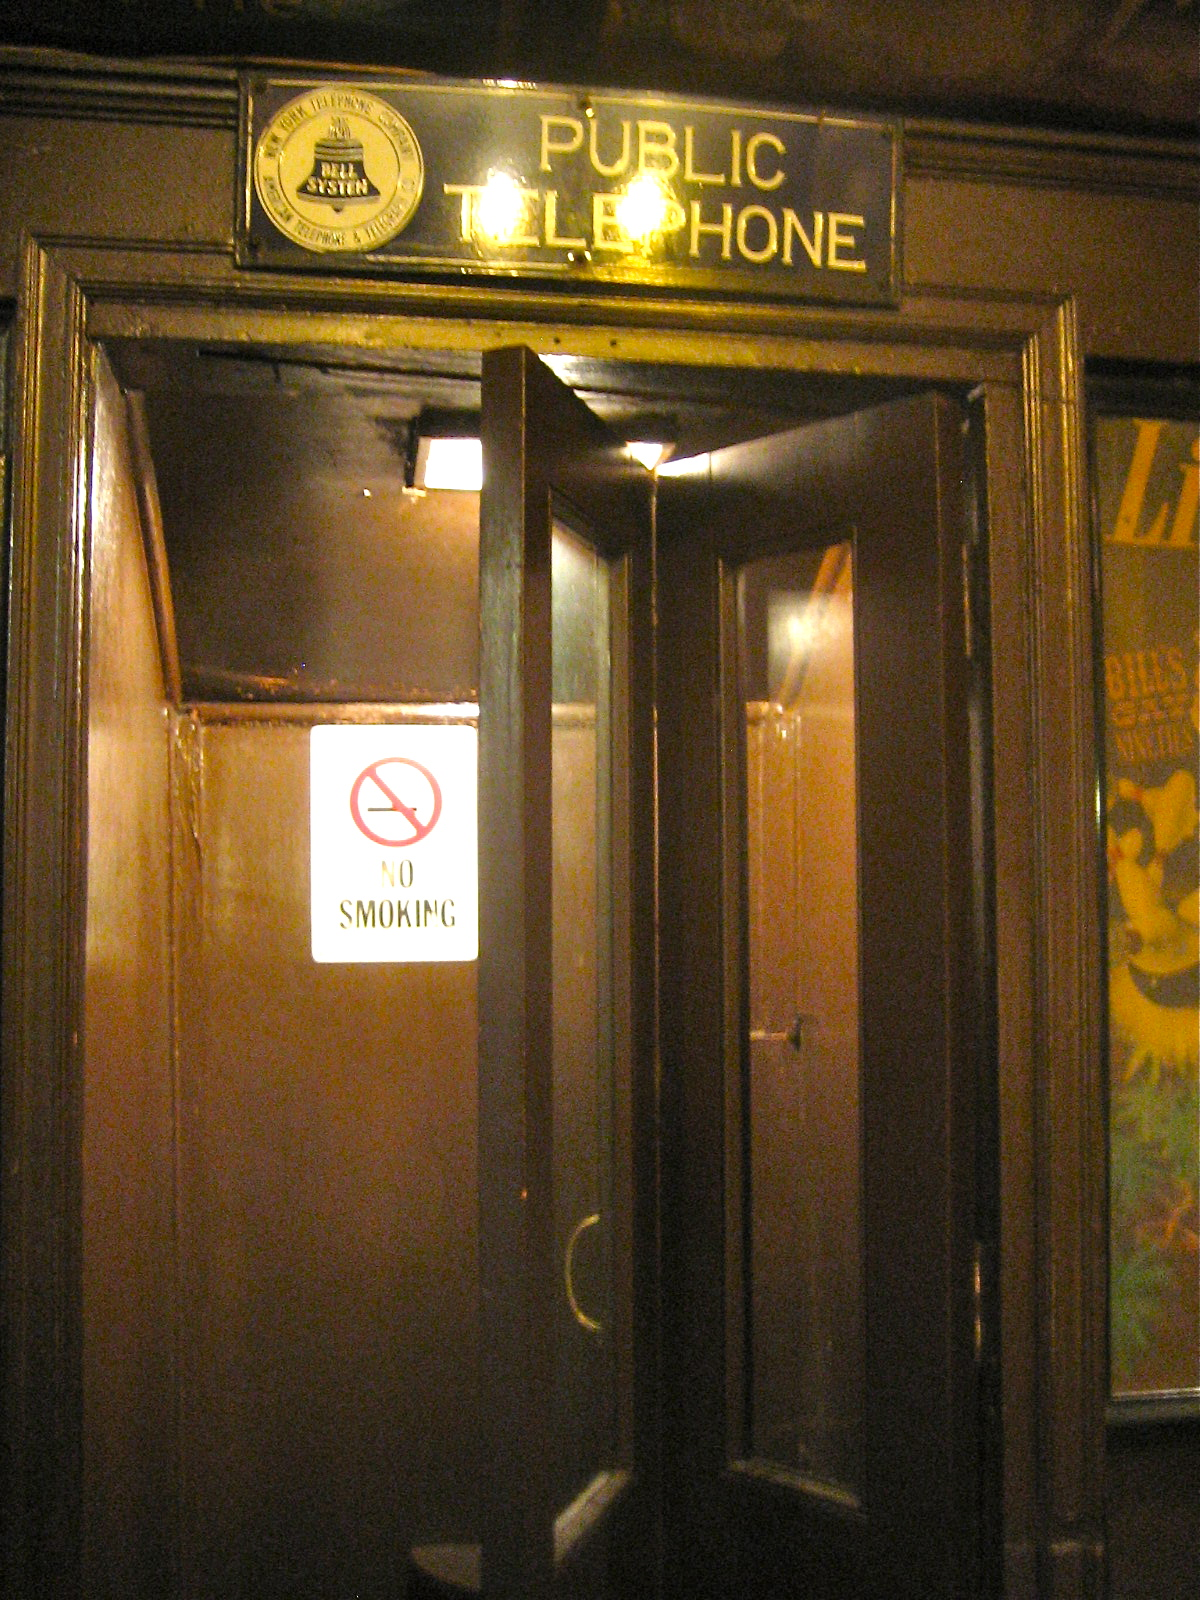 New Restaurant in Bills Gay Nineties Space Opens Tomorrow